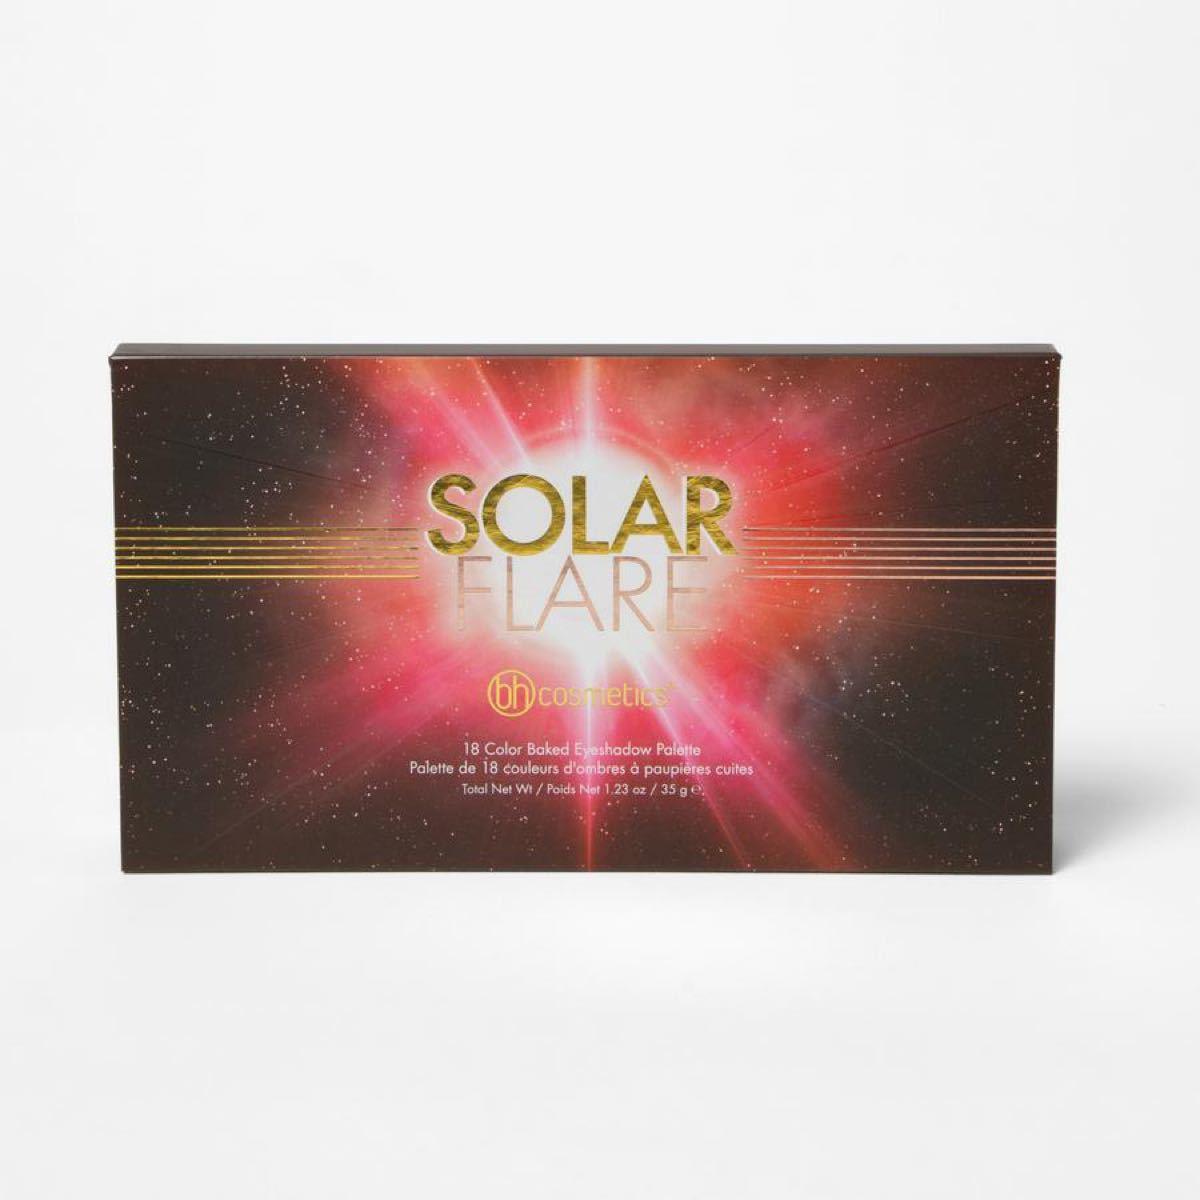 Solar Flare アイシャドウ パレット コスメ bhcosmetics